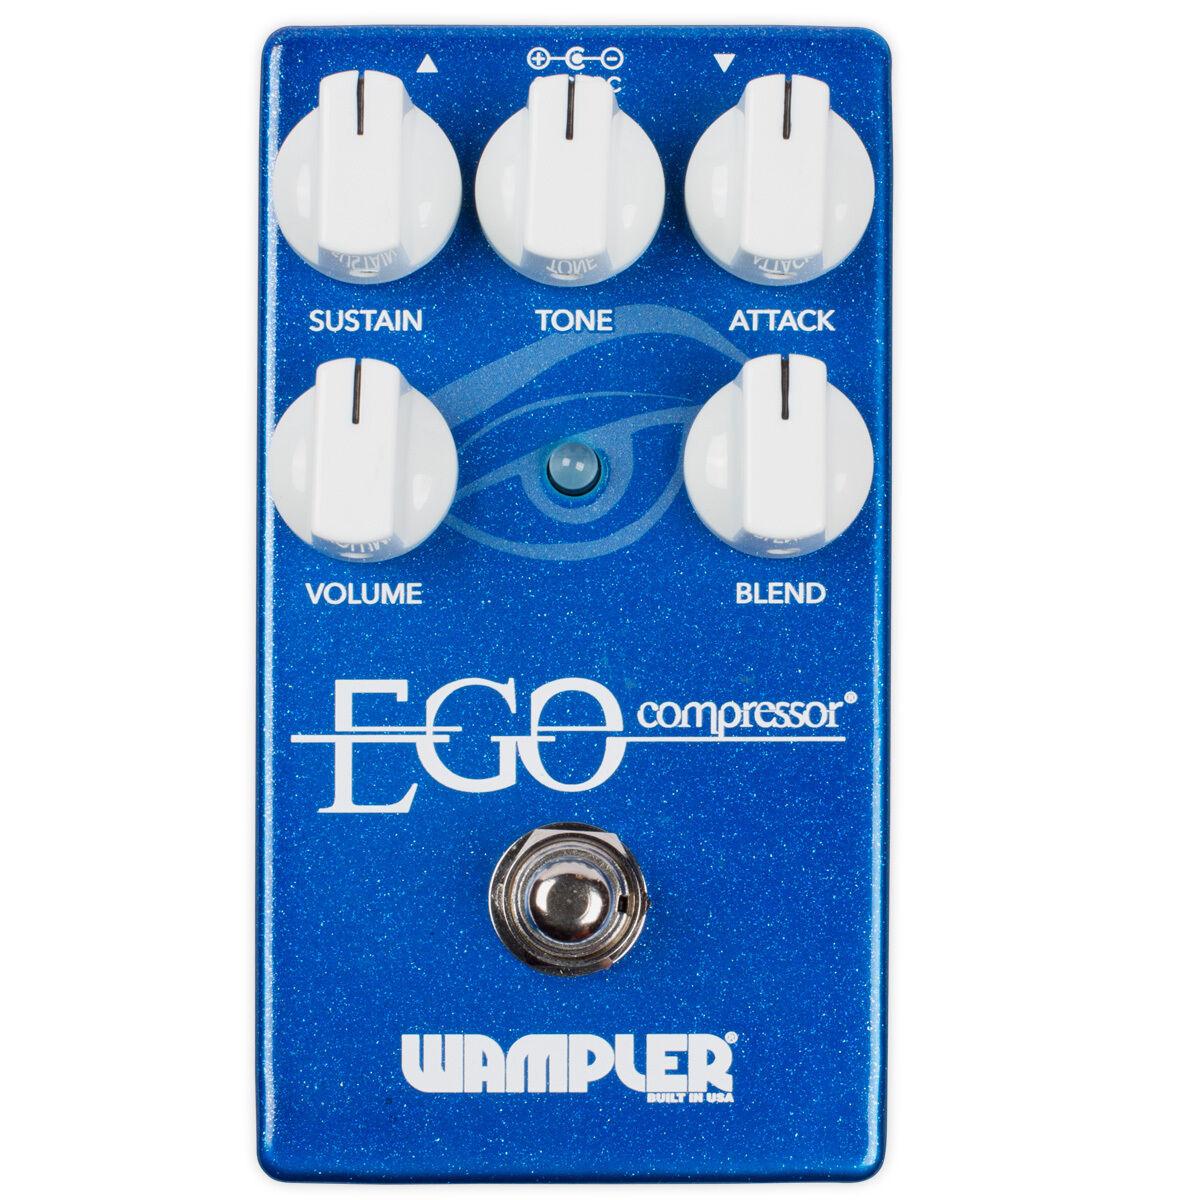 Wampler Pedals Ego Compressor Brand New Guitar Effect Pedal worldwide shipping